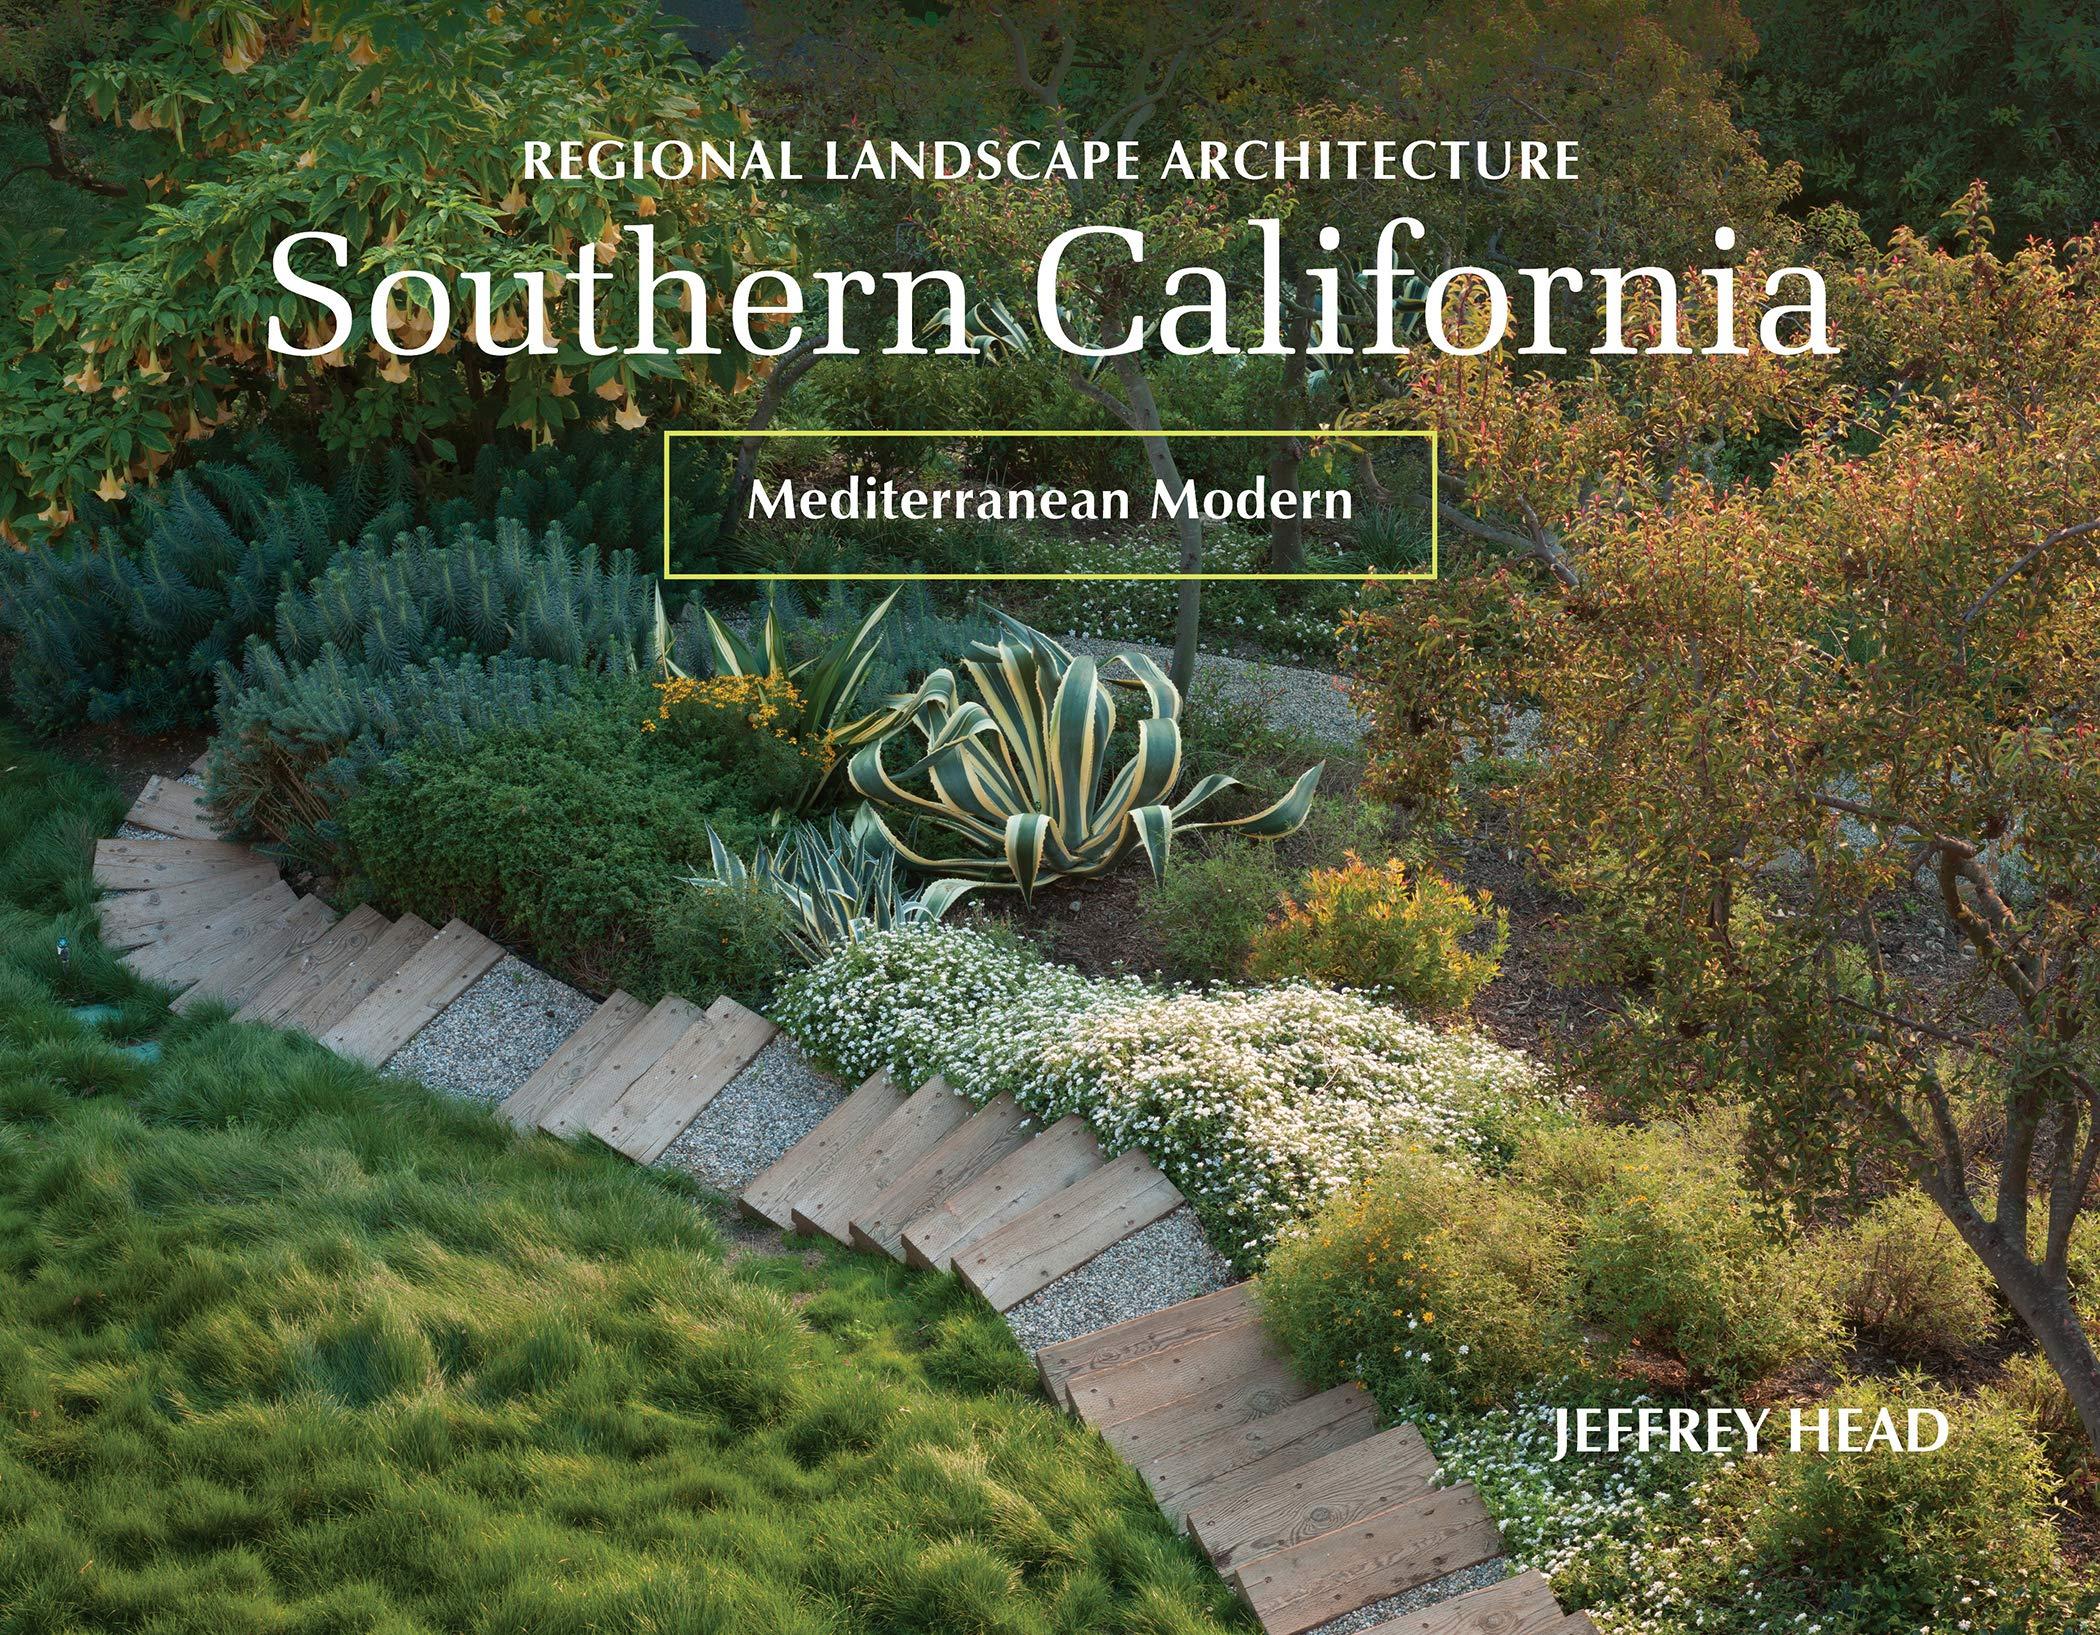 Regional Landscape Architecture Southern California